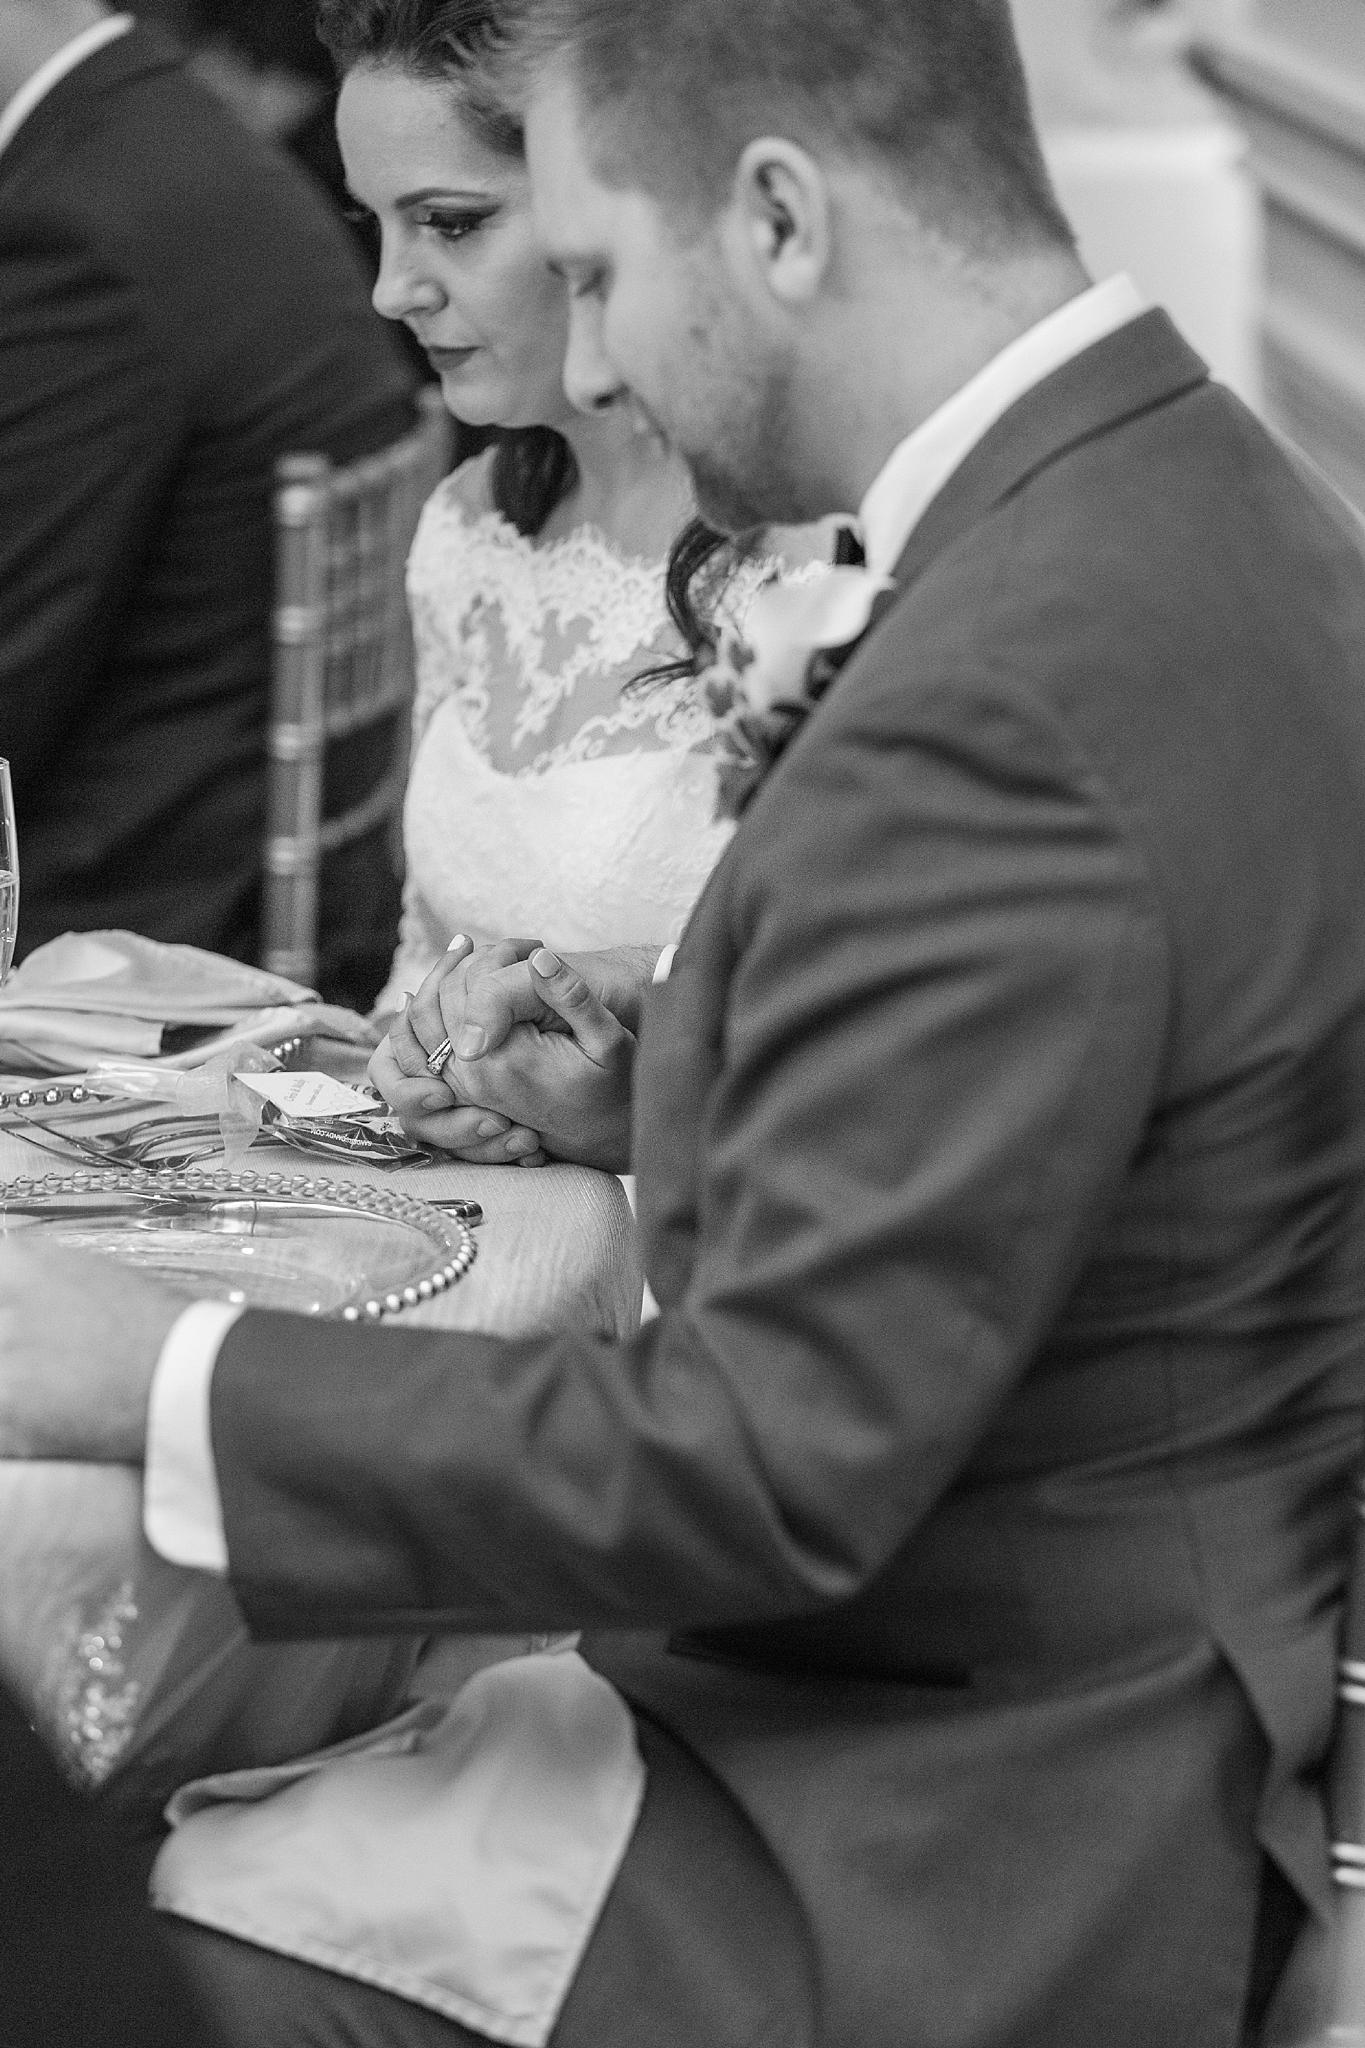 detroit-colony-club-wedding-regal-romantic-photography-in-detroit-mi-by-courtney-carolyn-photography_0040.jpg